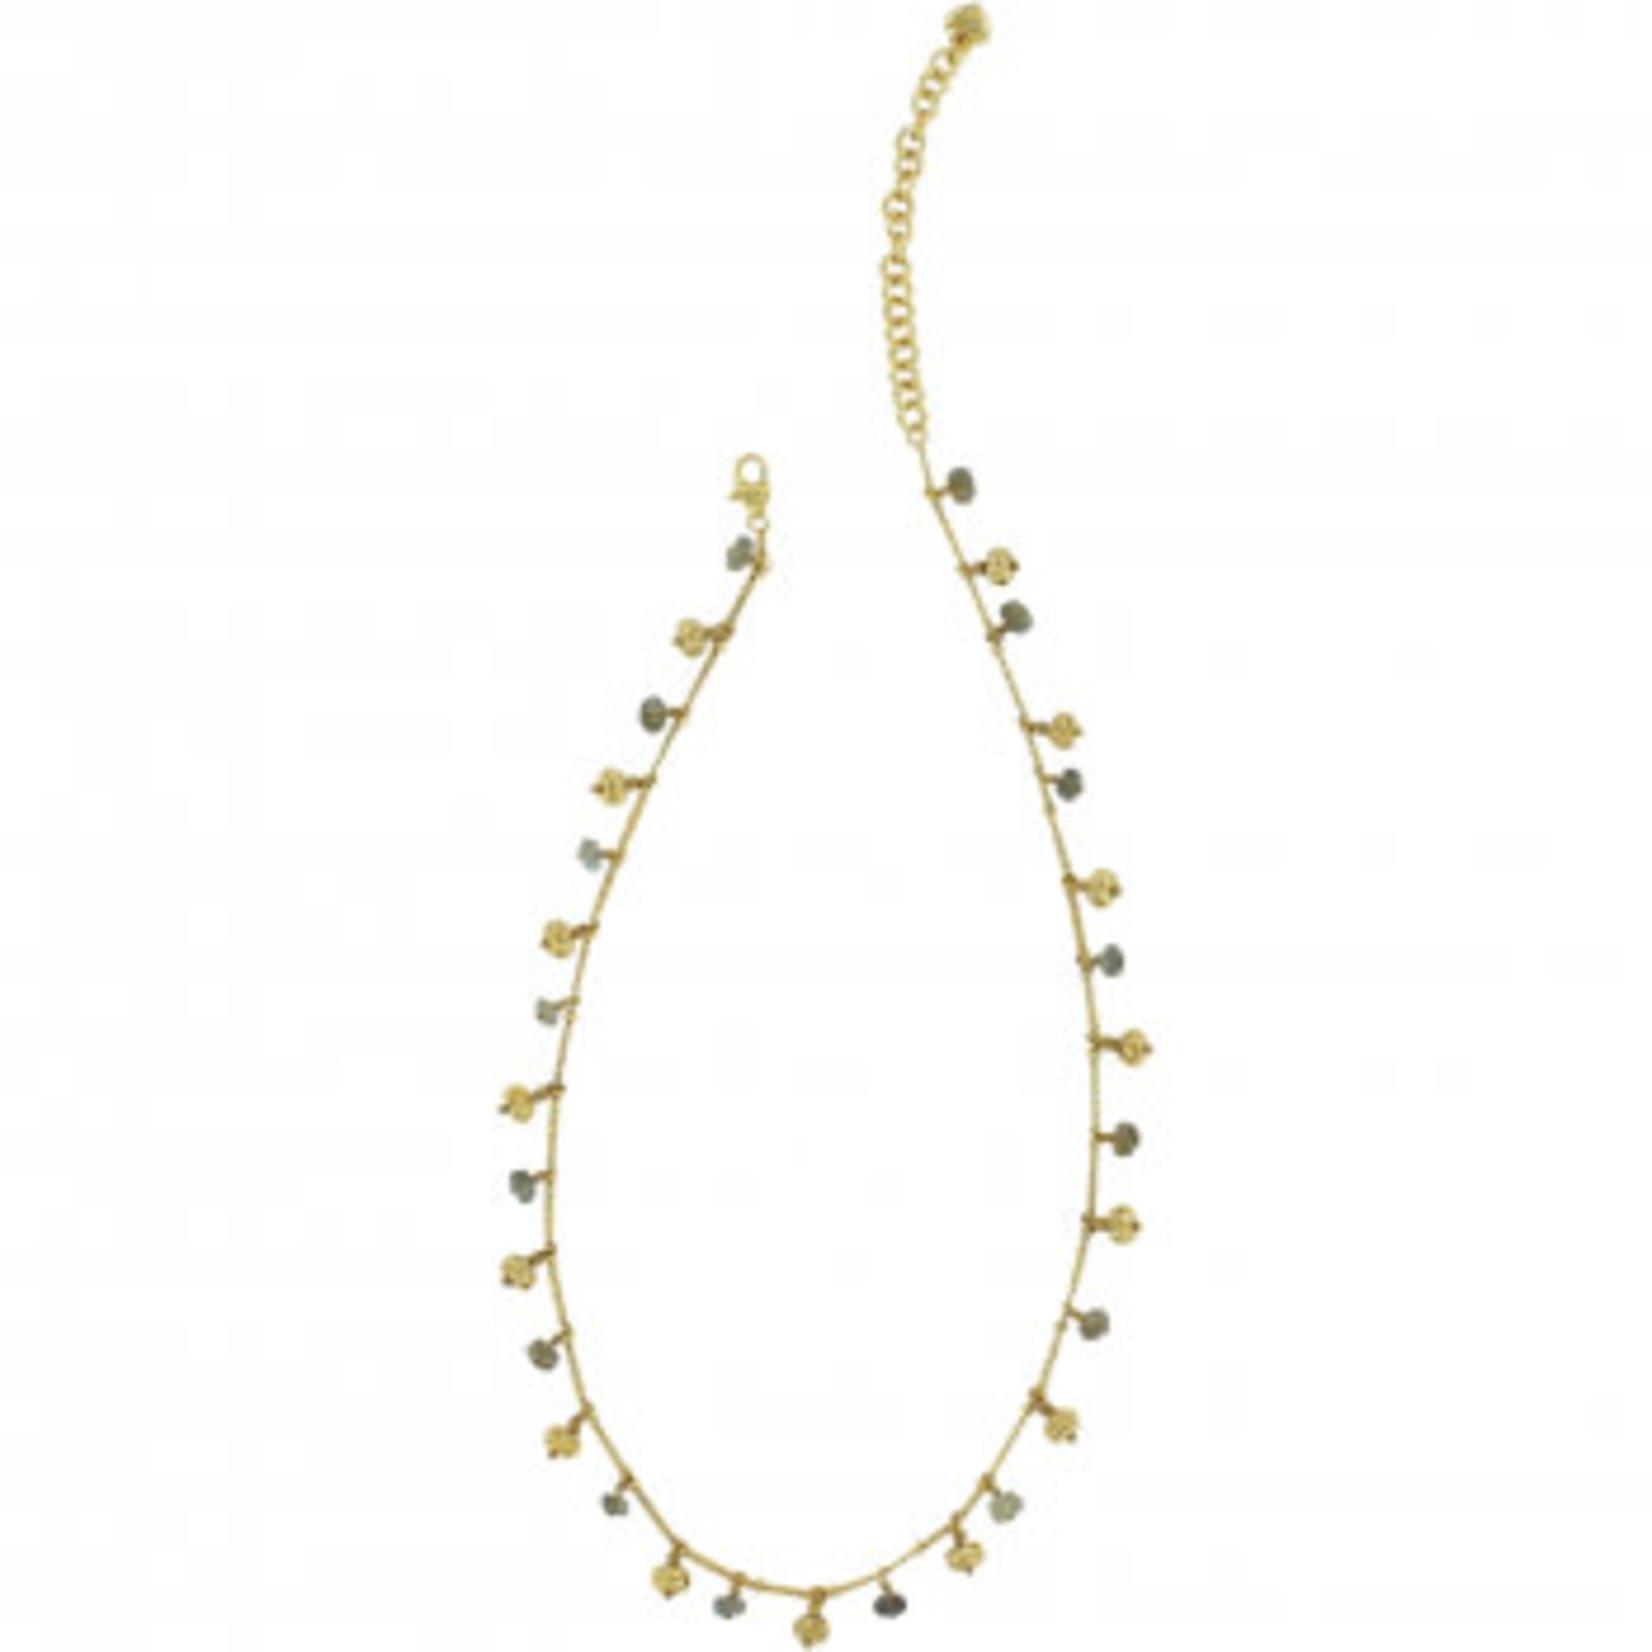 Brighton Gold Play of Light Short Necklace